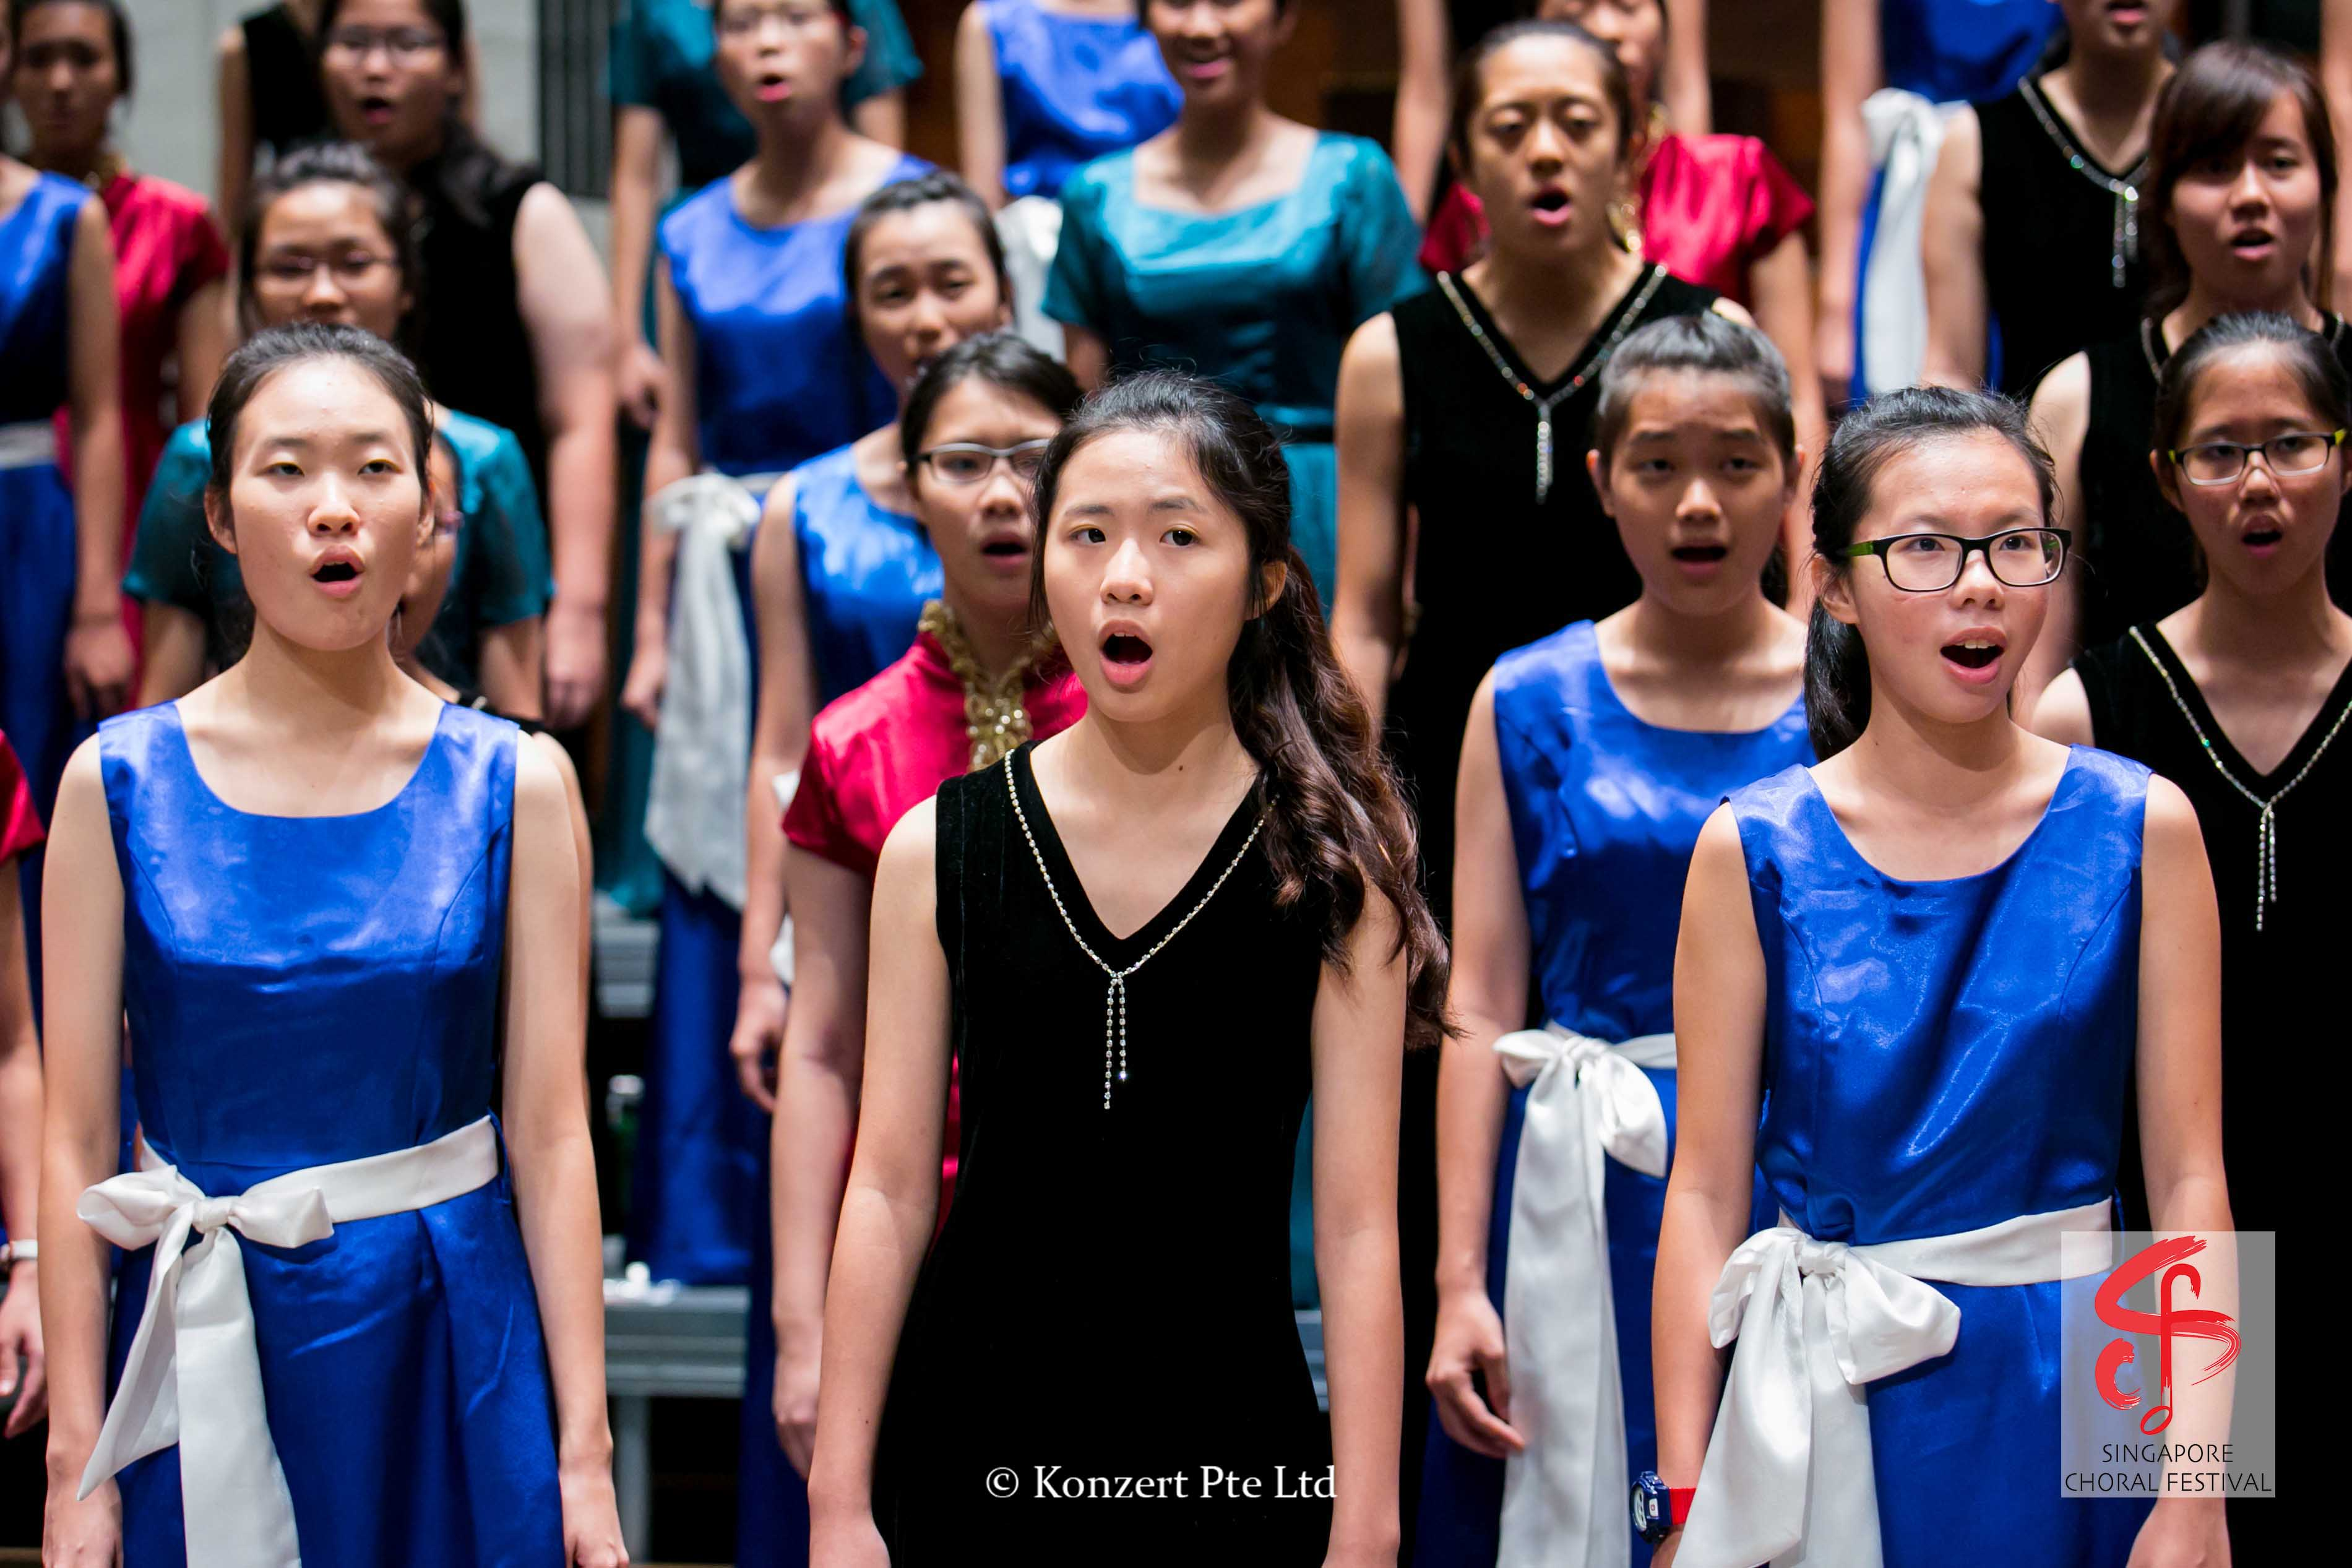 Singapore Choral Festival 7-8-15 (127).jpg